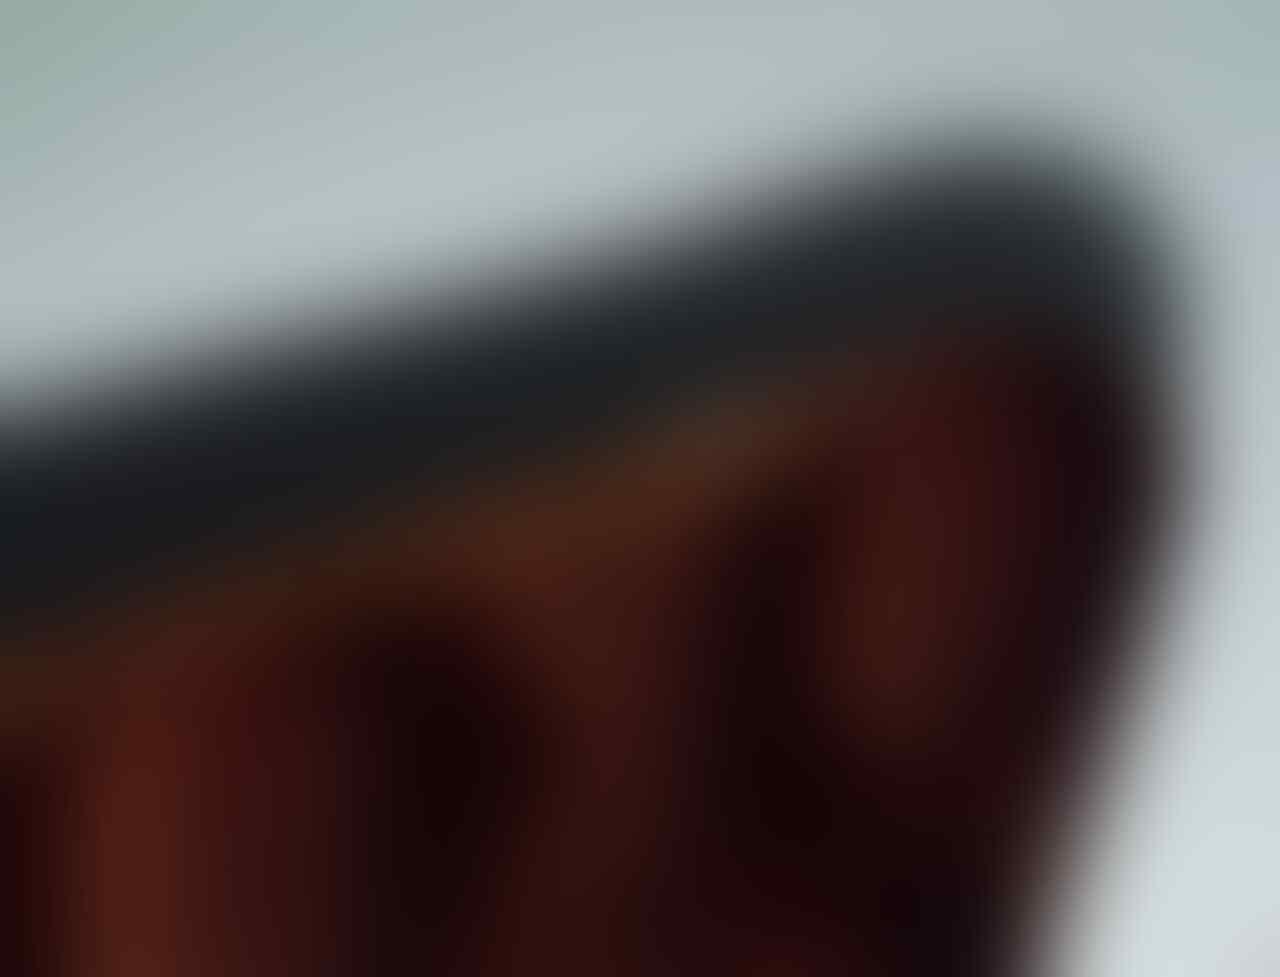 Cat Tepian Pinggir Kulit - Leather Edge Finishing Paint (Leather Good's)